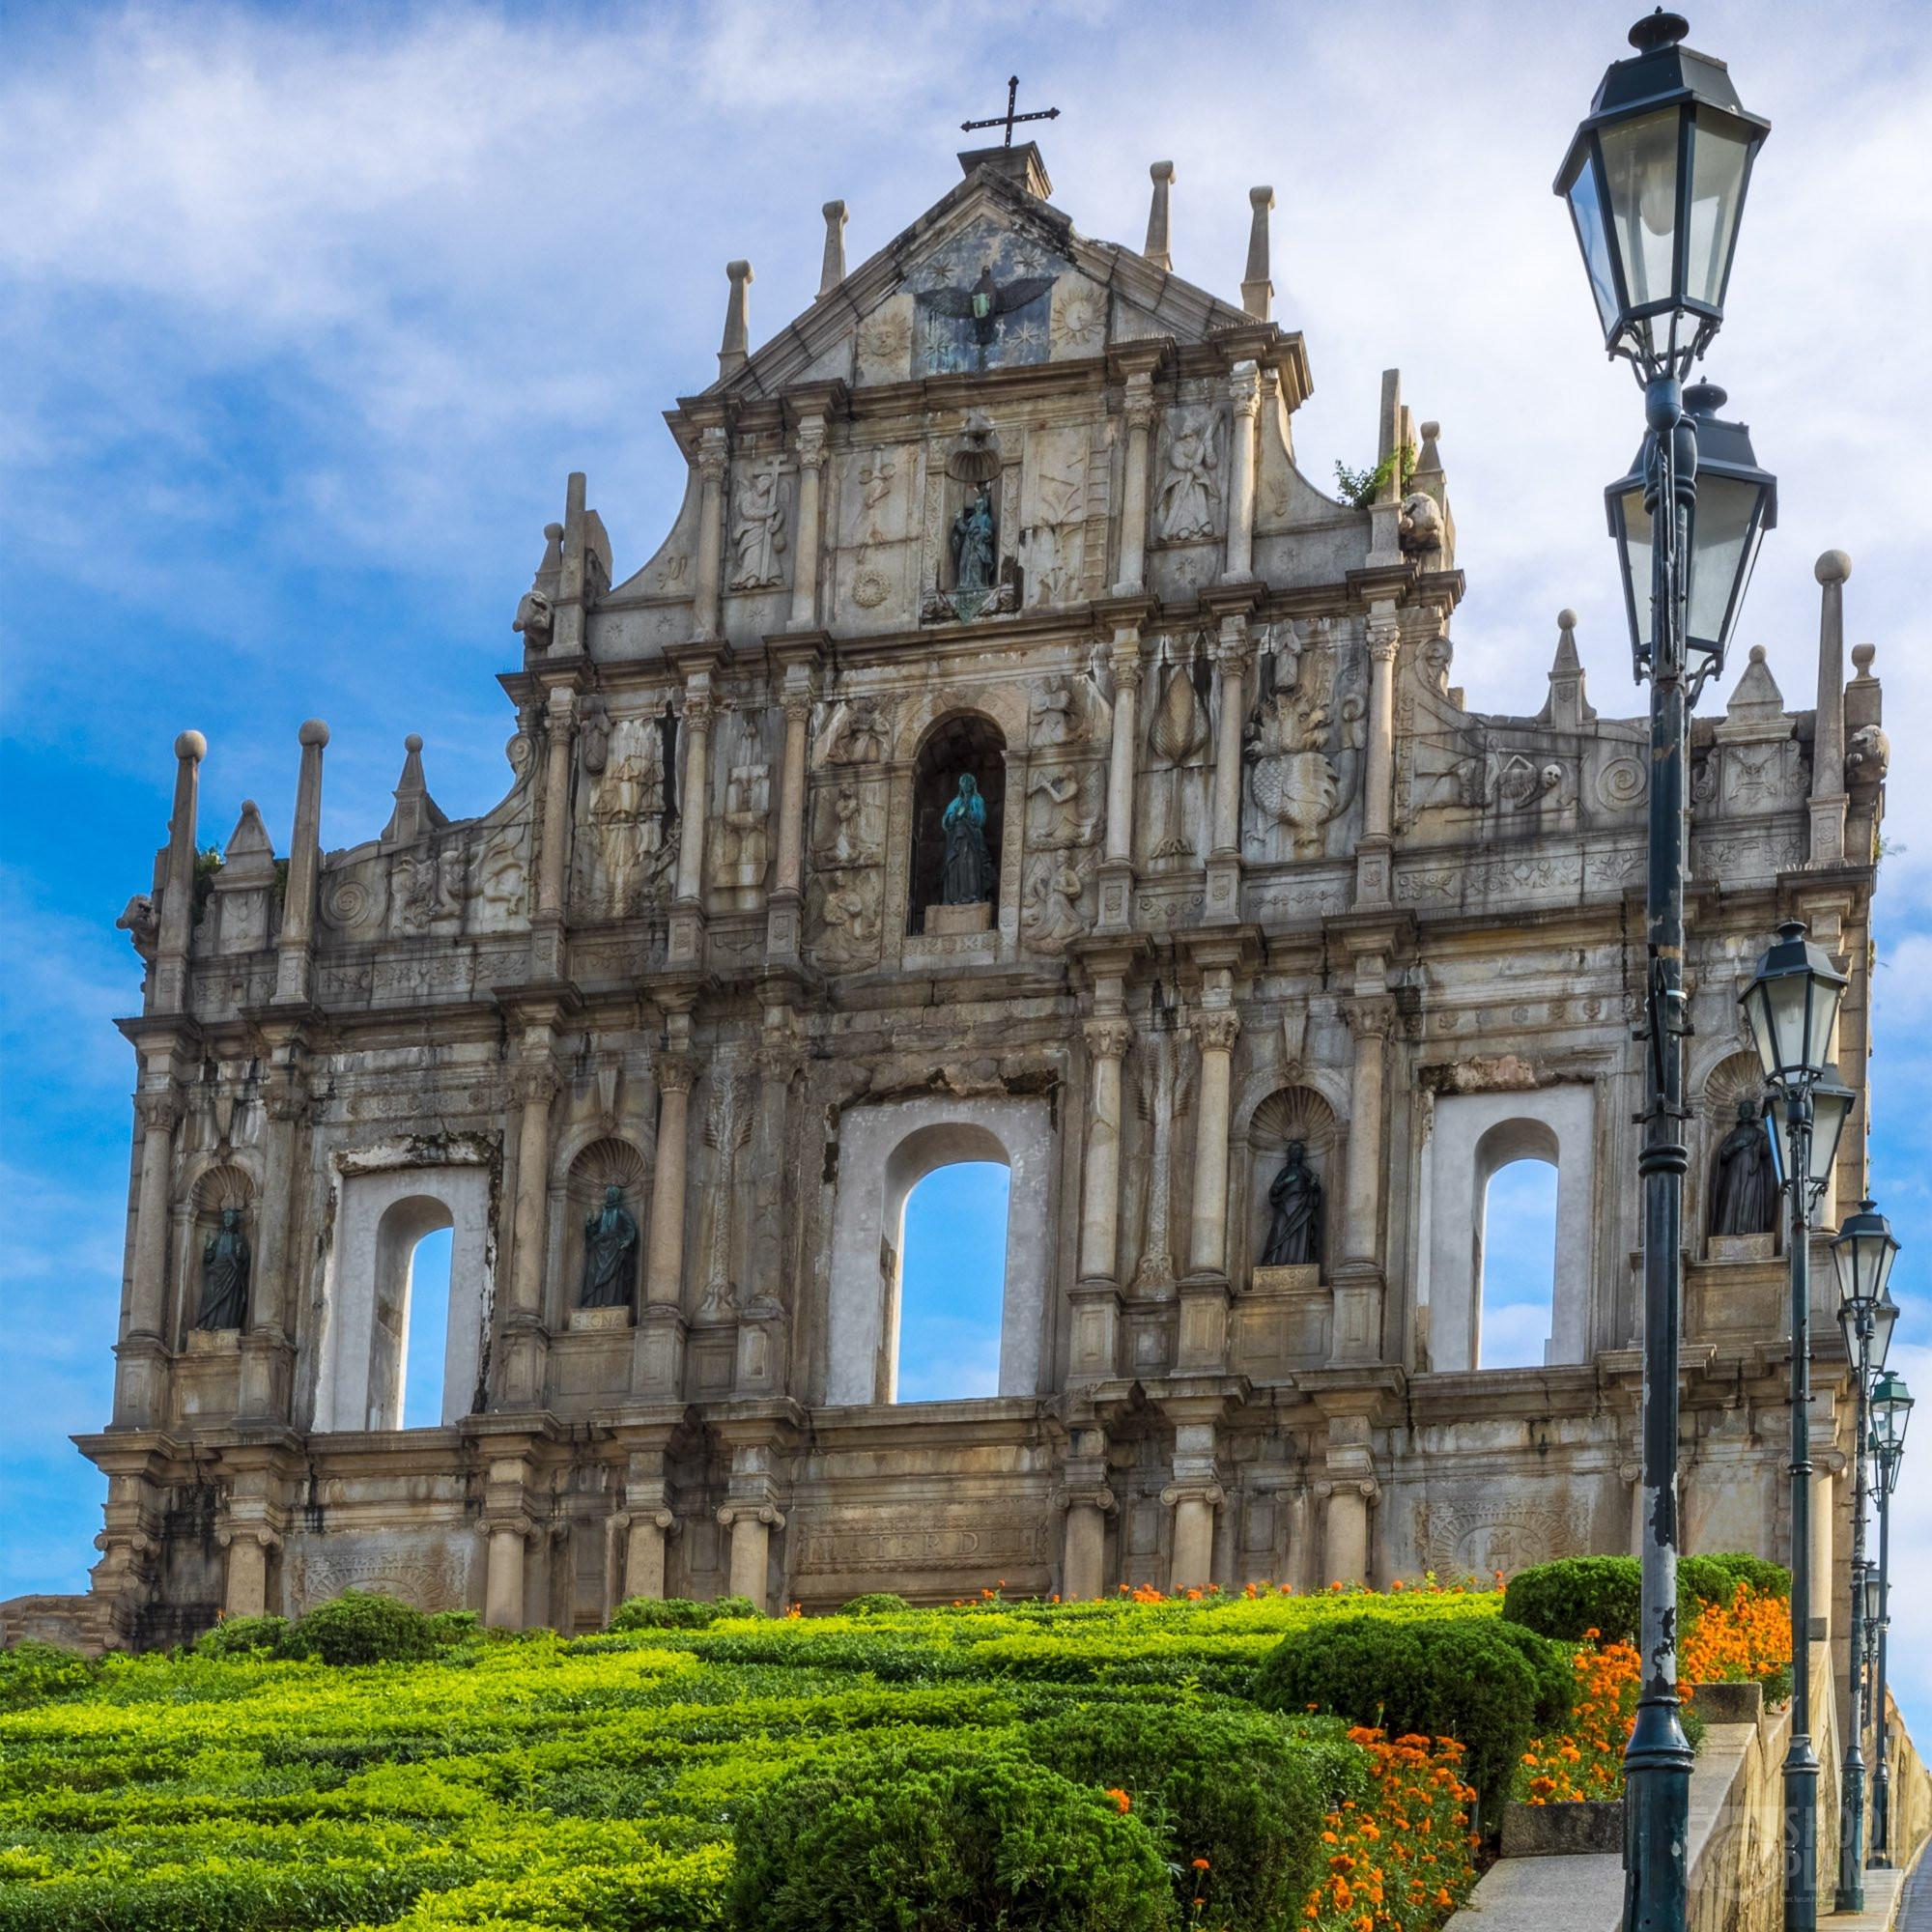 Portuguese Saint Paul cathedral ruins, Macao China